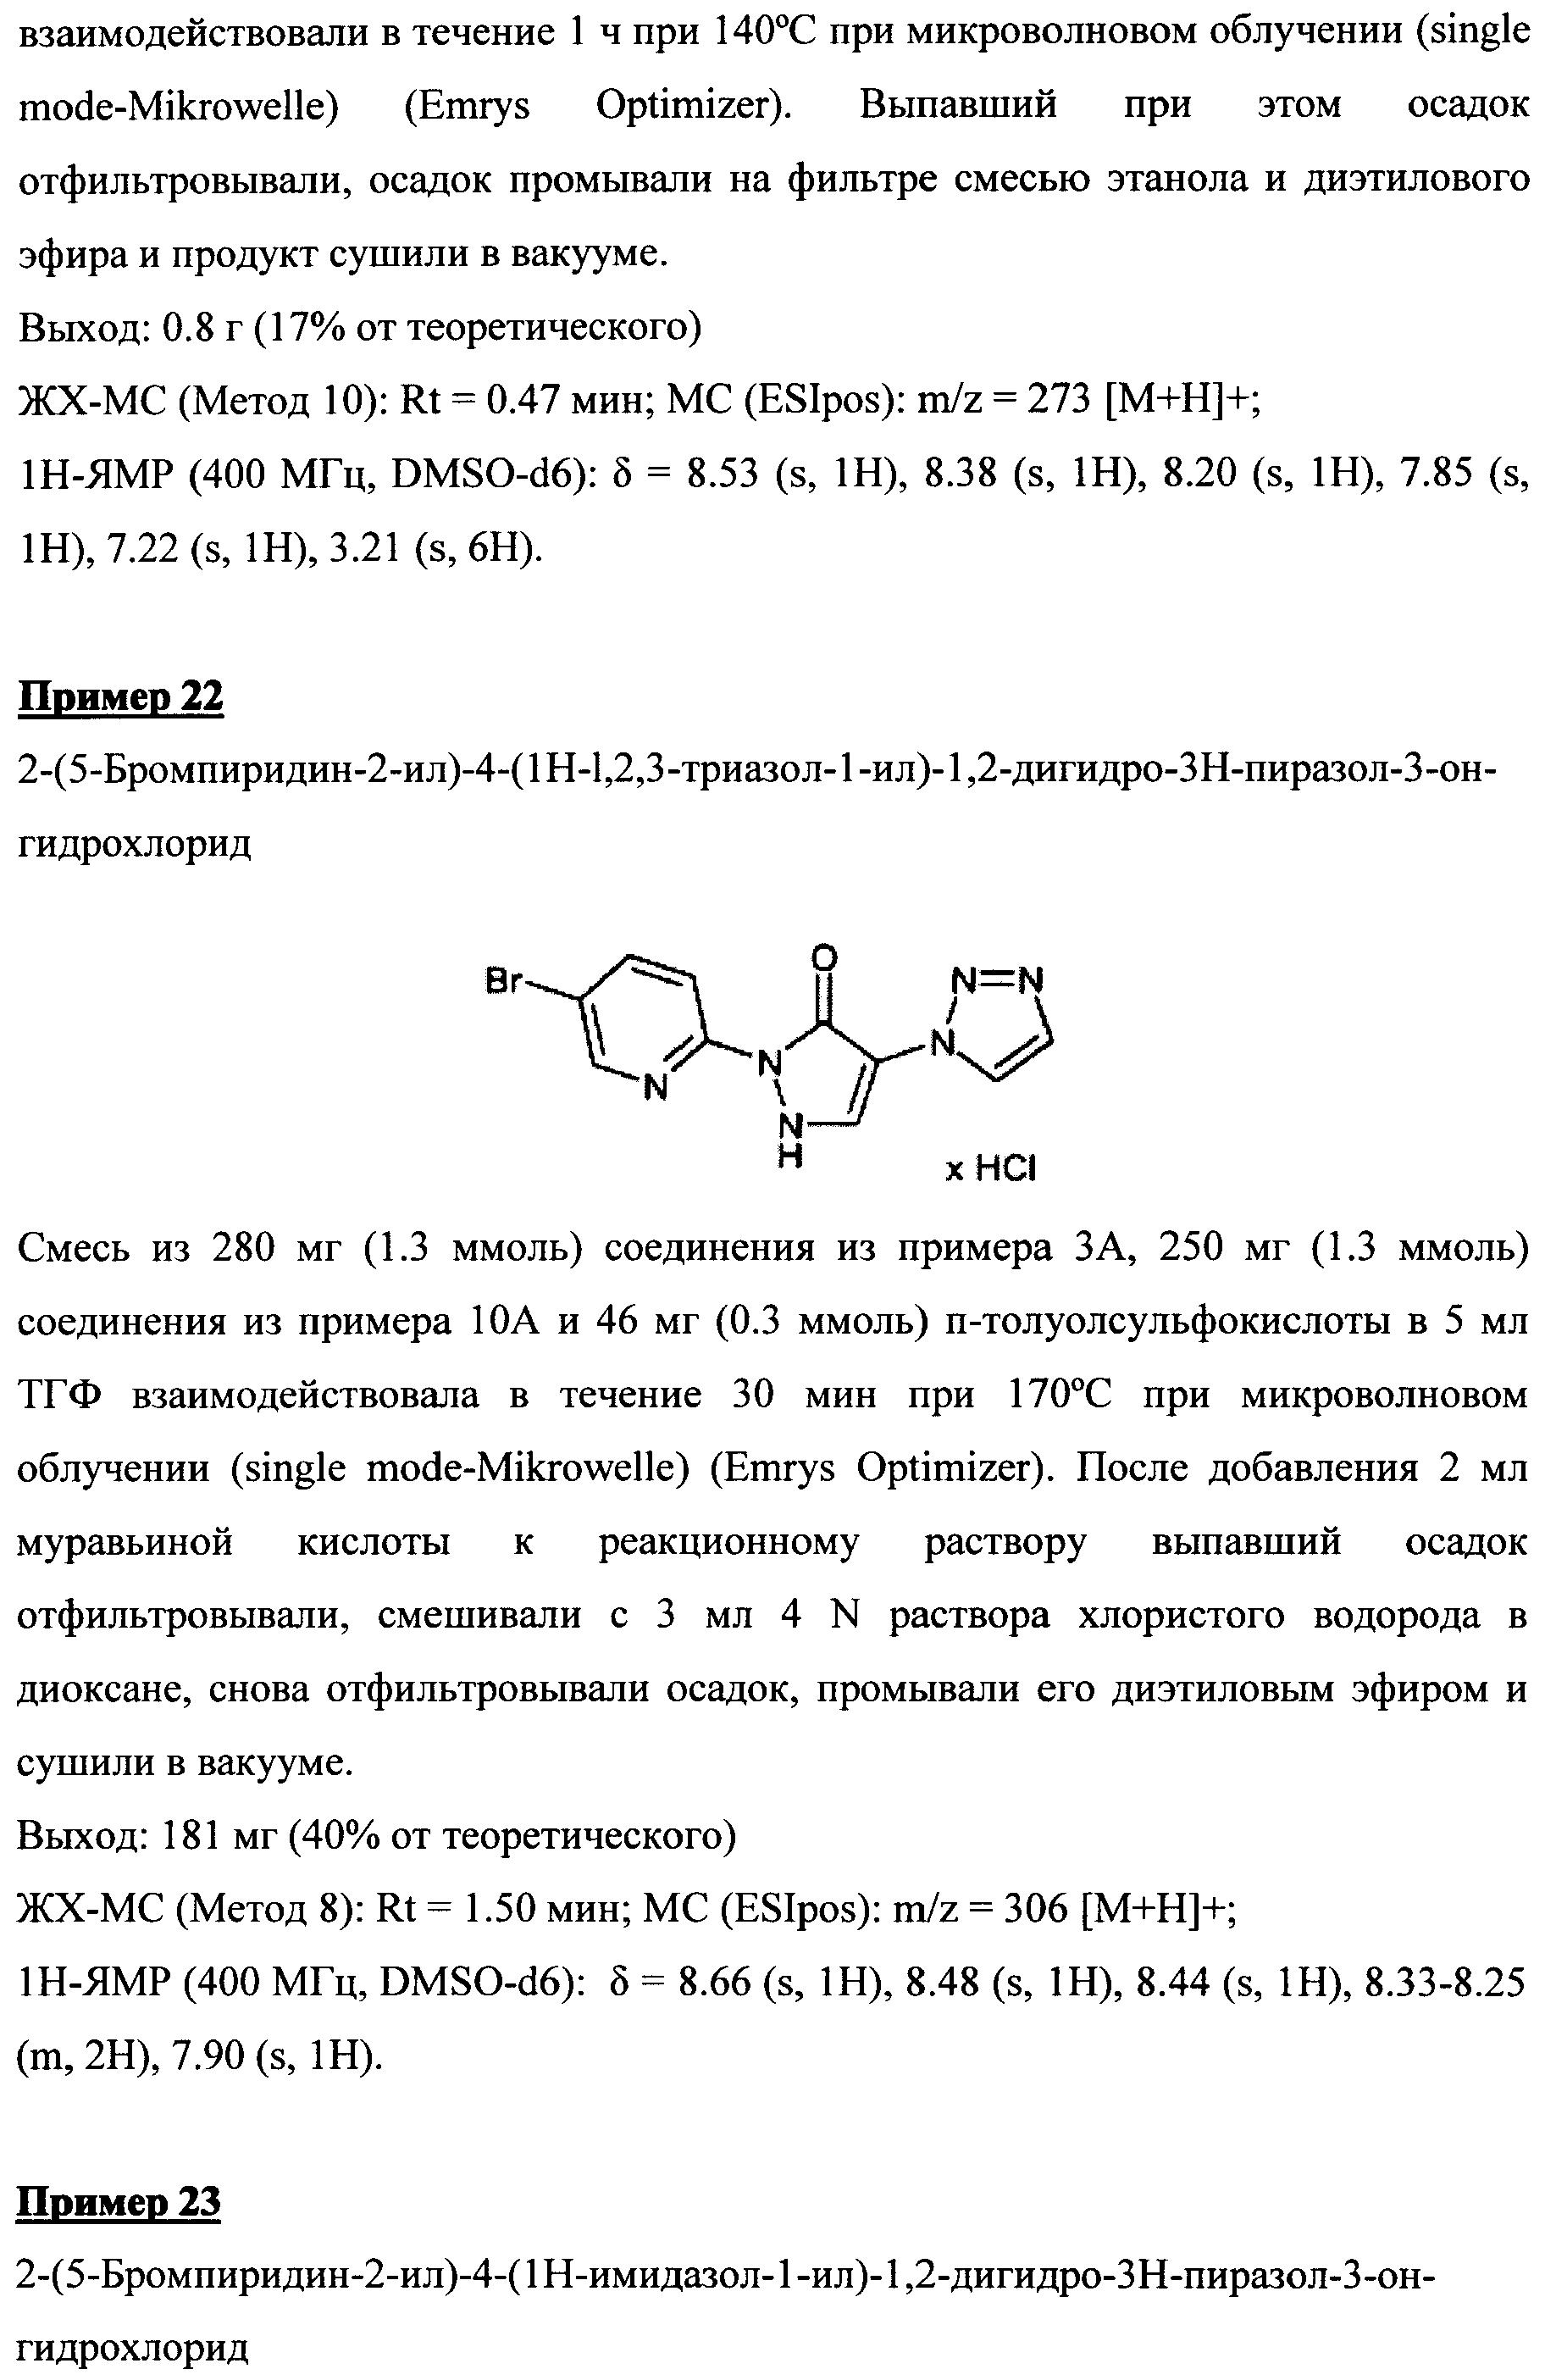 Figure 00000094